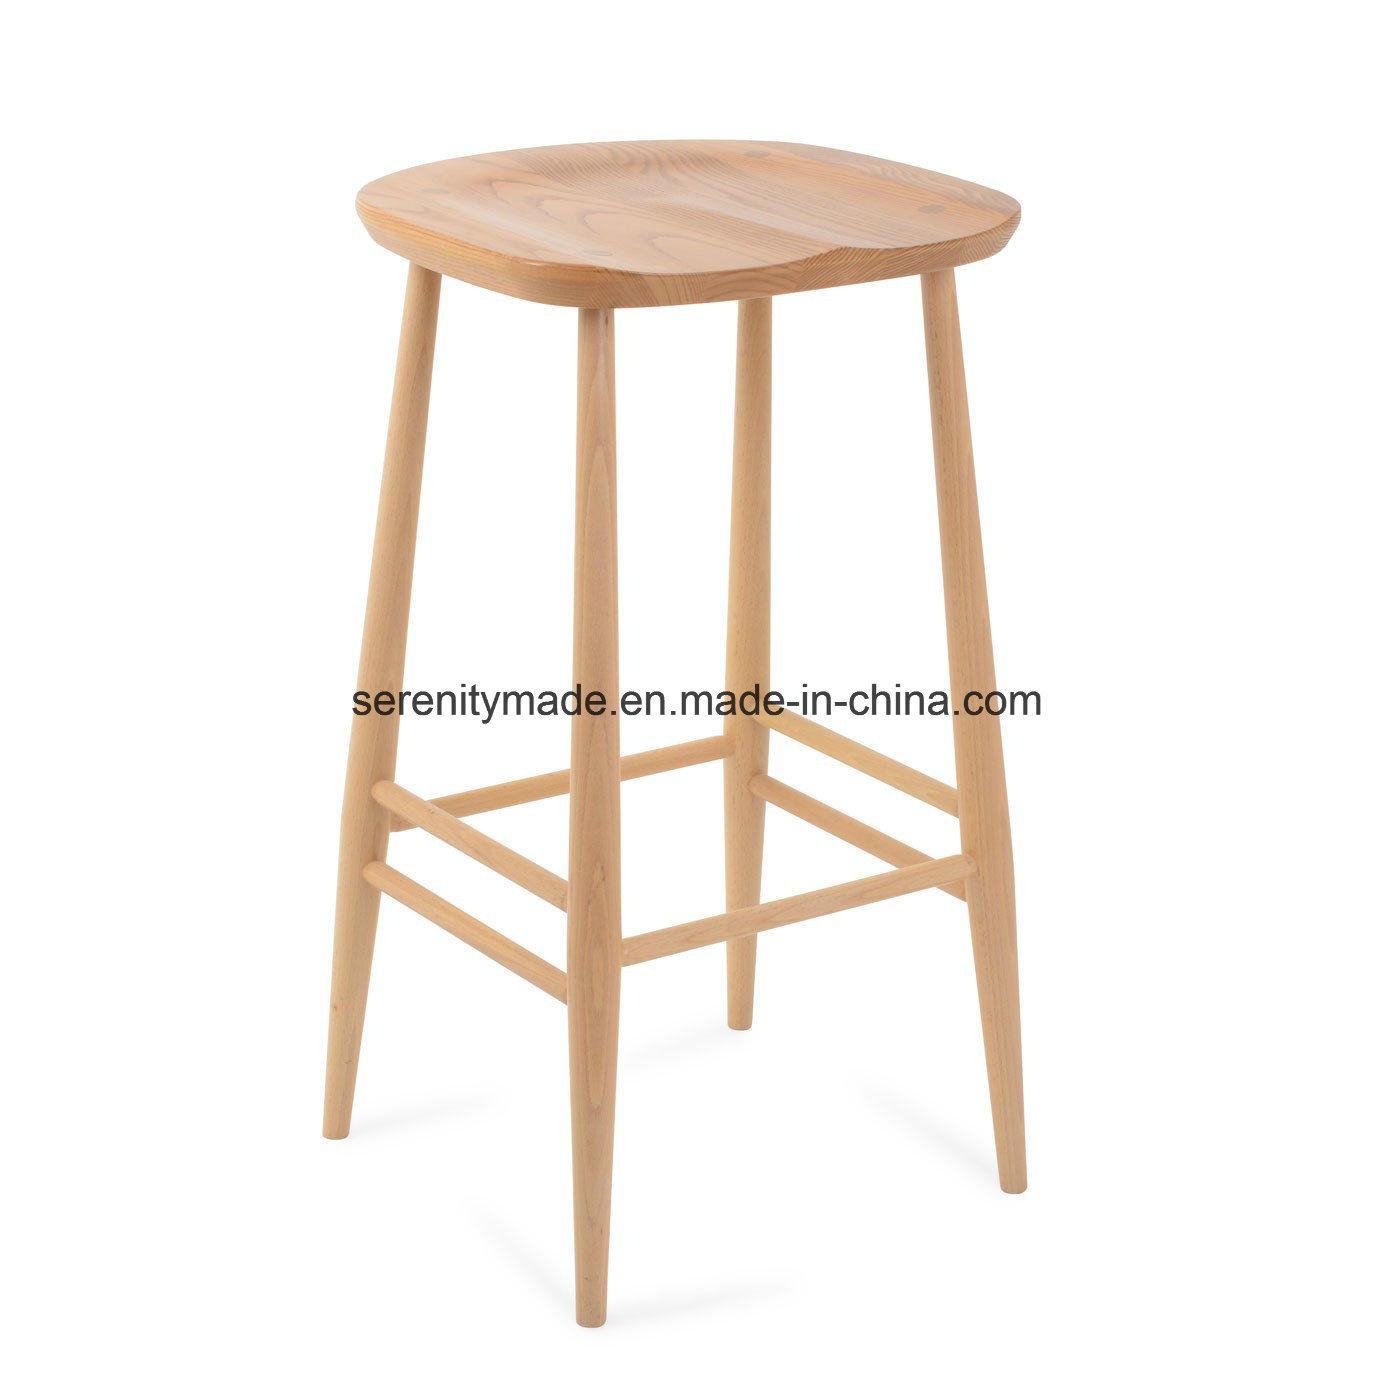 Fabulous Hot Item High Quality Solid Ash Wood Tractor Seat Counter Bar Stool Creativecarmelina Interior Chair Design Creativecarmelinacom